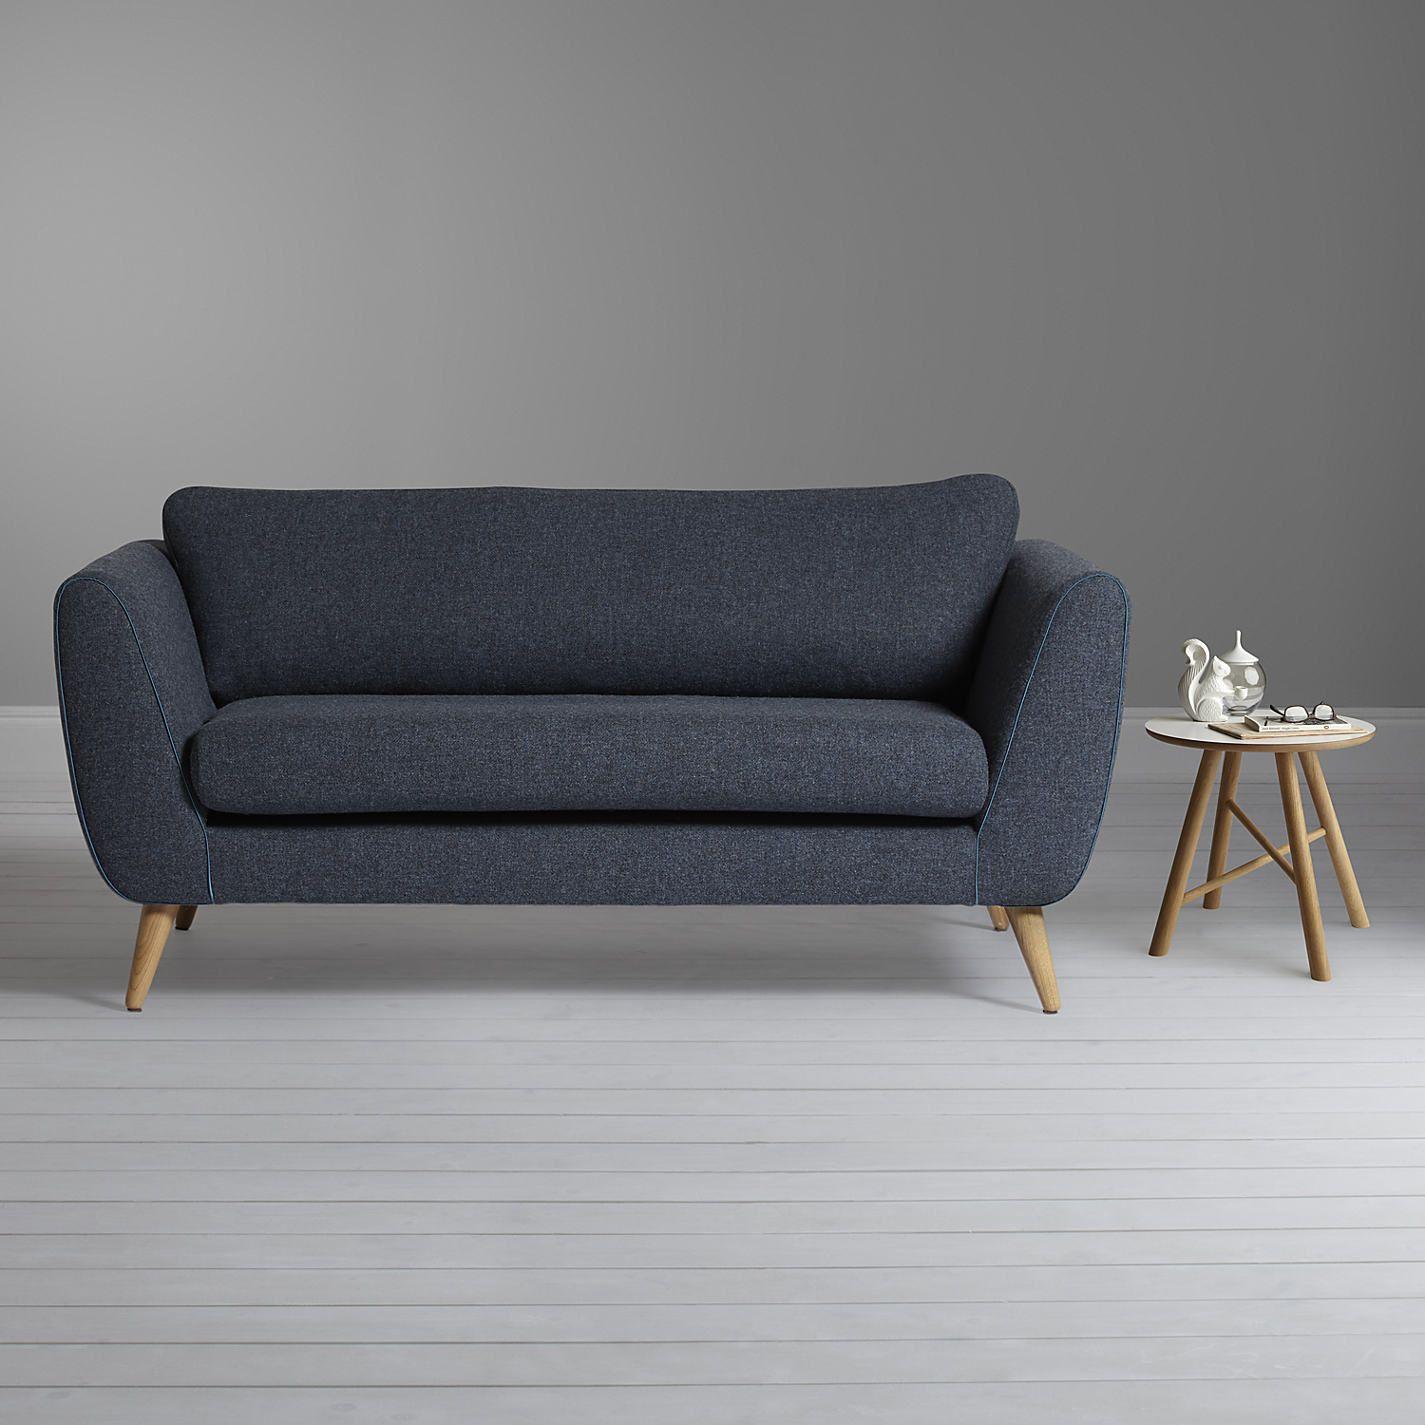 tweed sofa john lewis baci living room. Black Bedroom Furniture Sets. Home Design Ideas